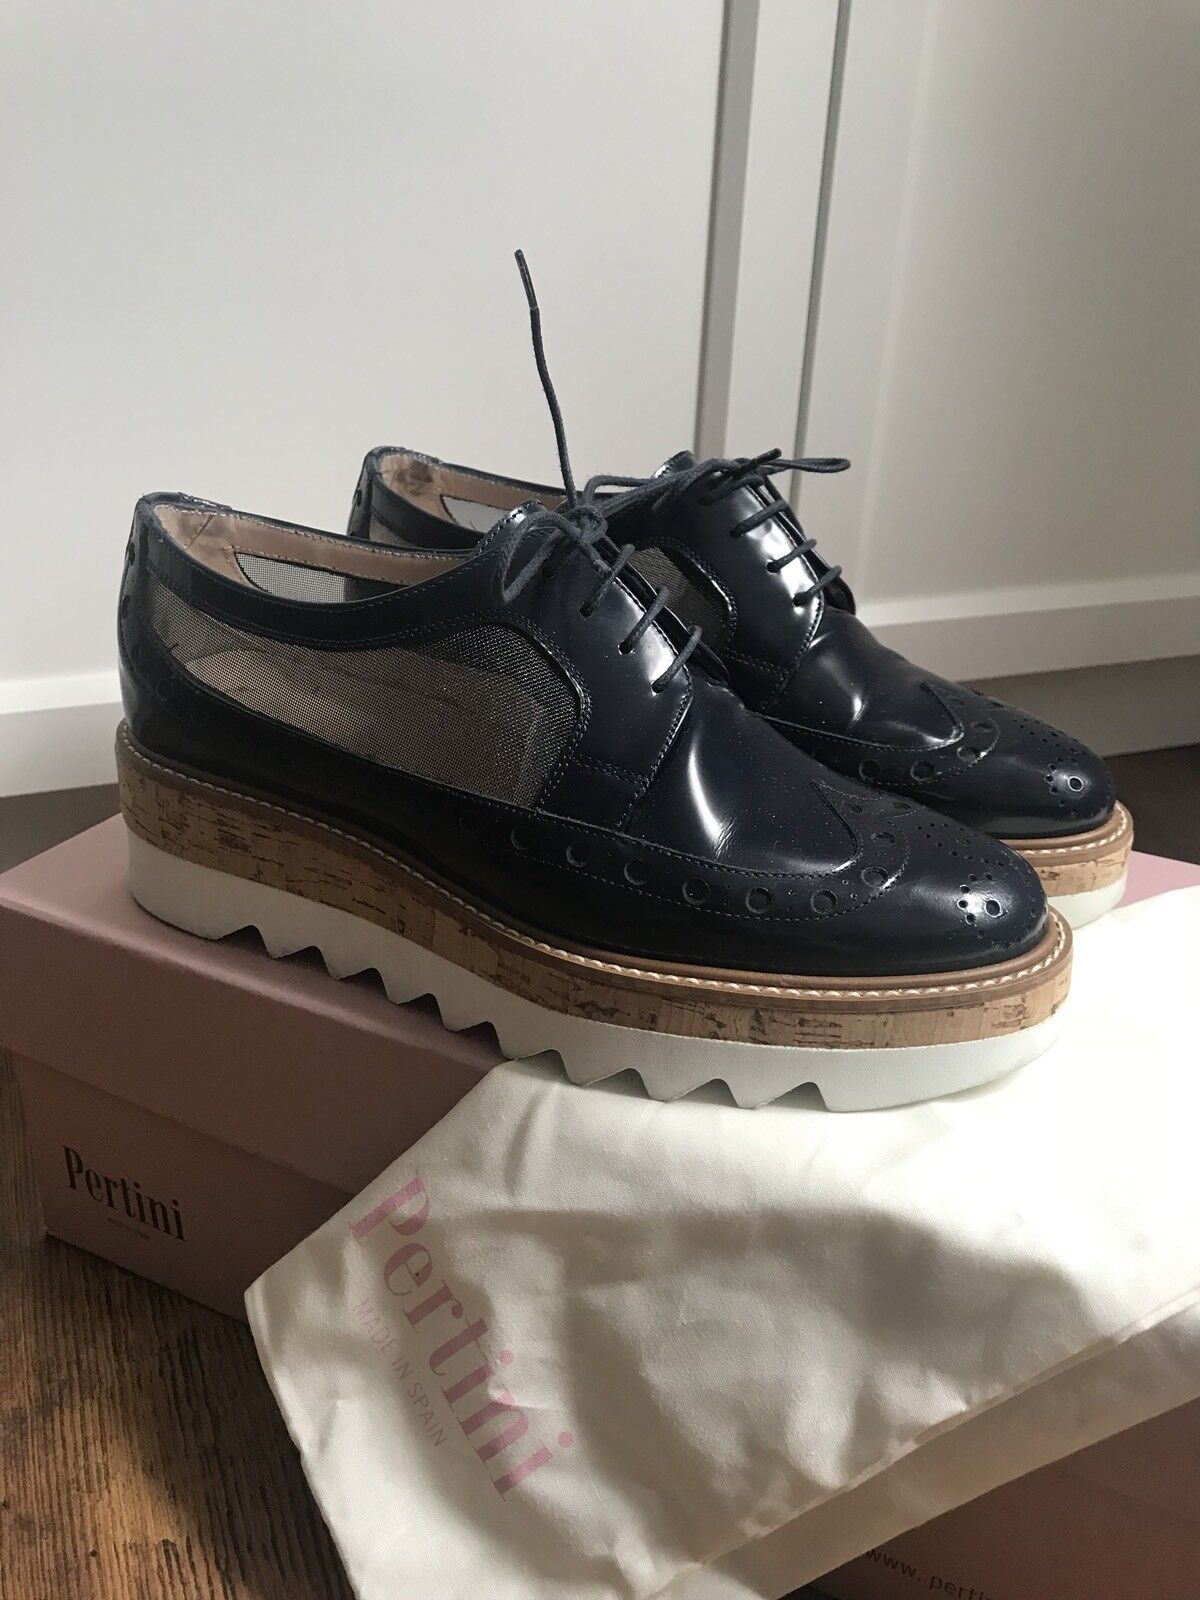 Kaufen Pertini Slipper Loafer Design schwarz Damen